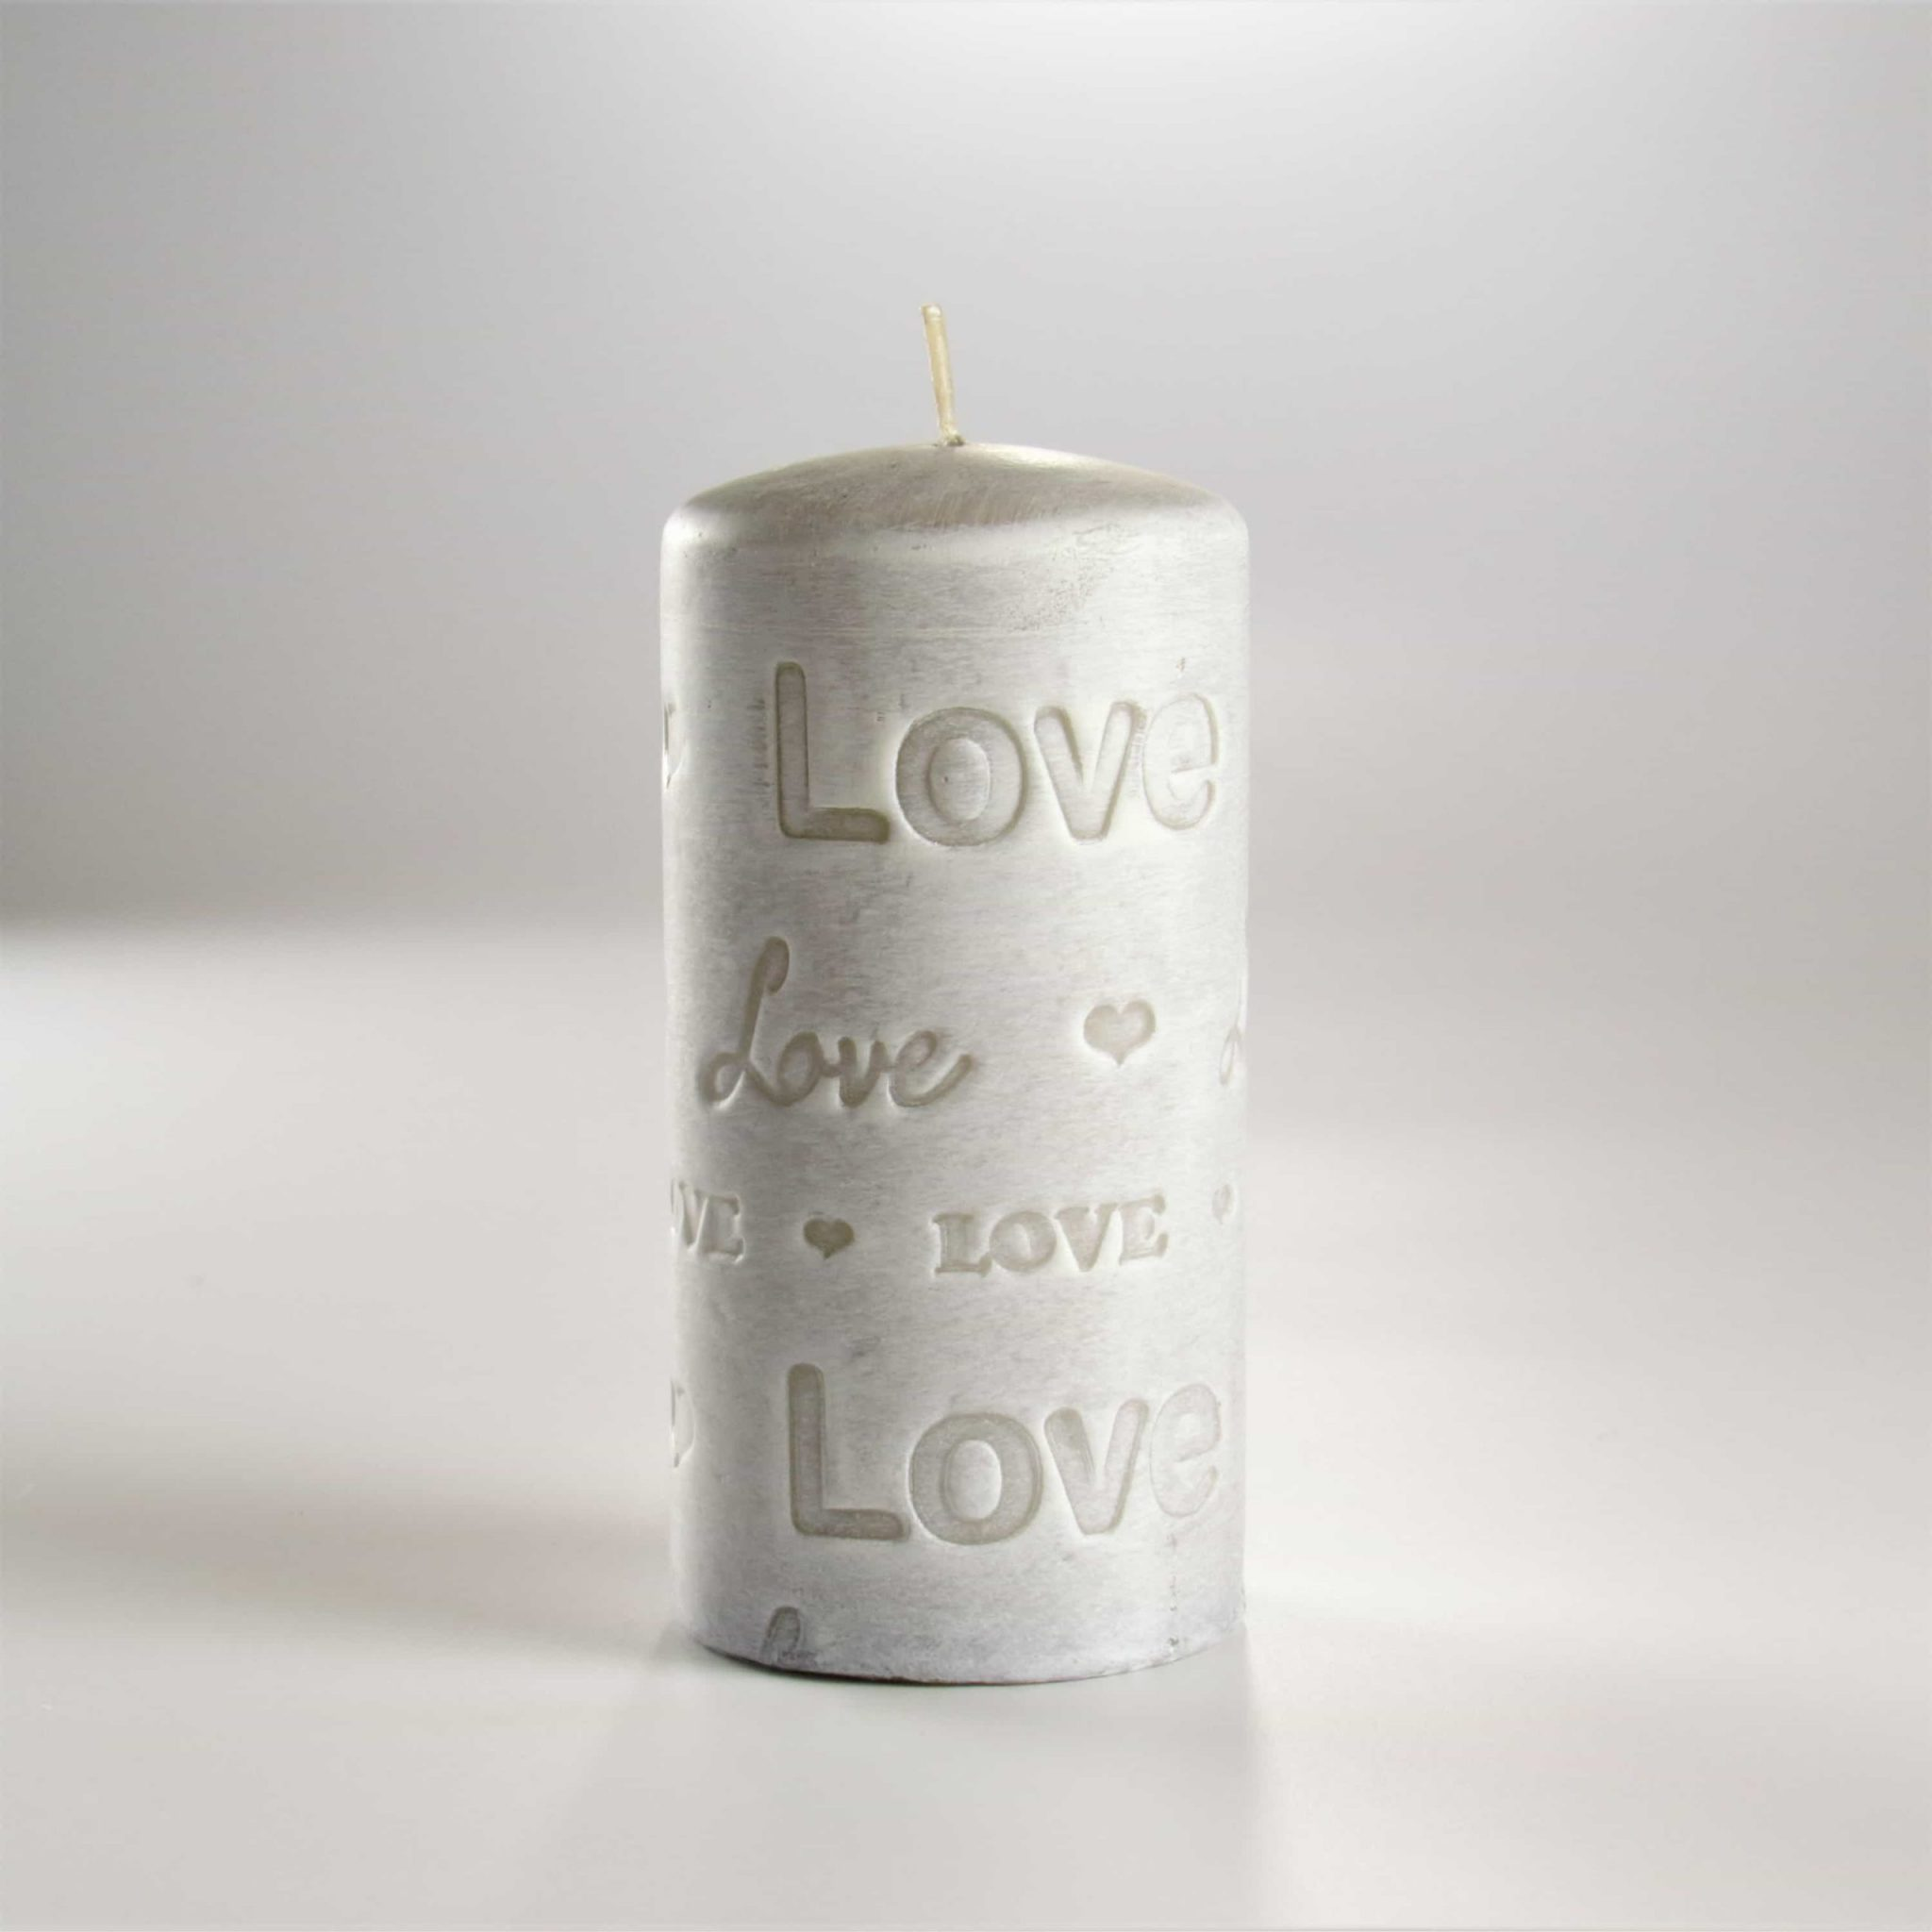 designer candles, wedding candles,